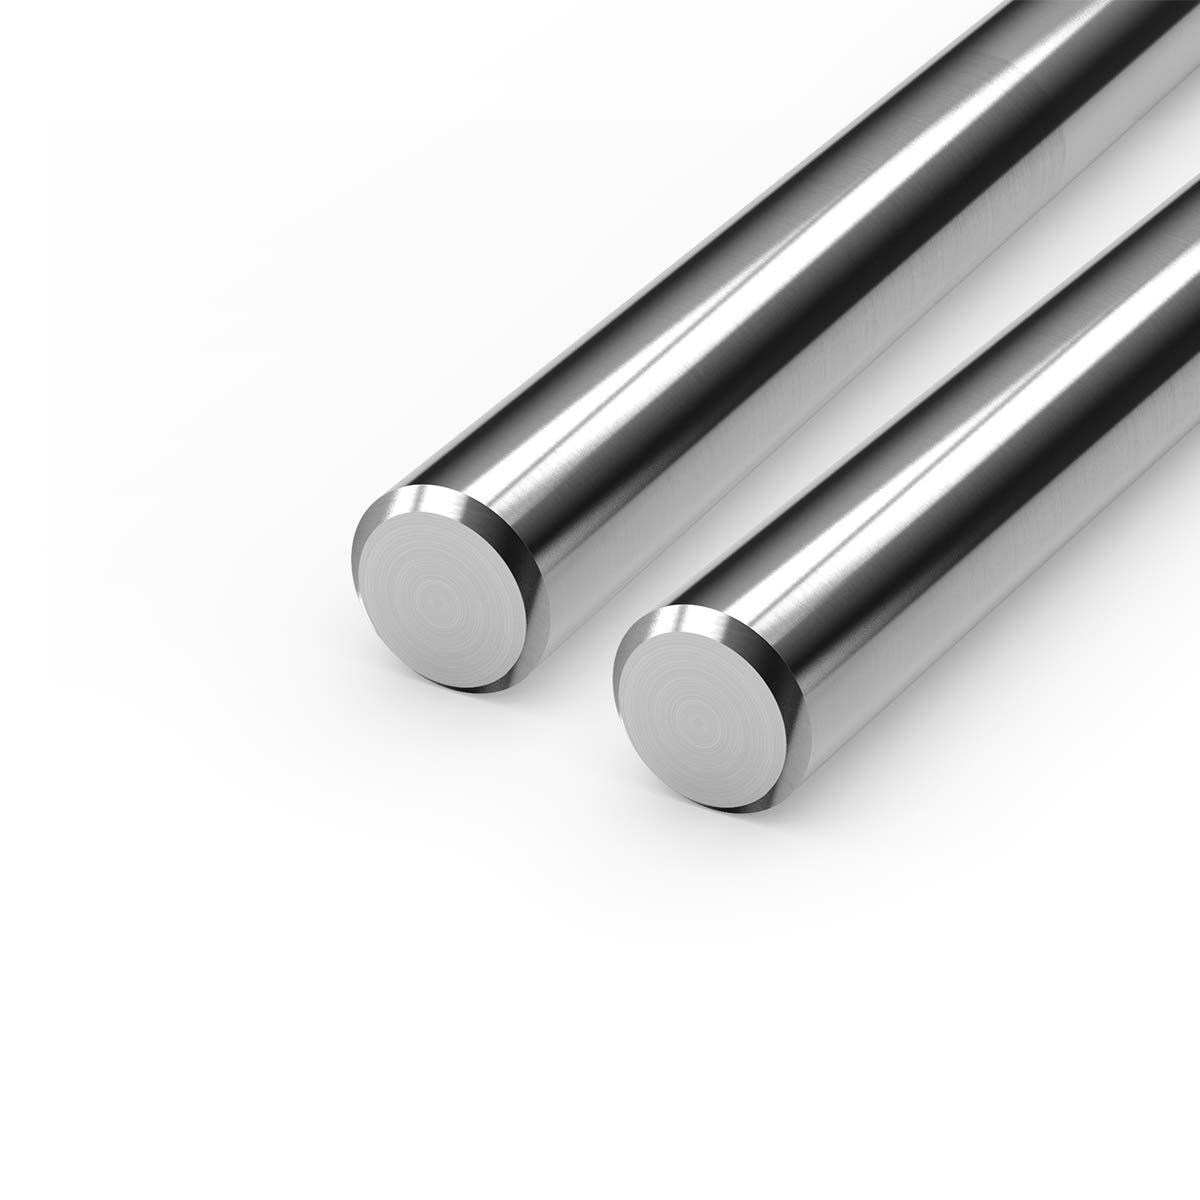 Linear Motion Rods, FEYRINX 2PCS 8mm x 300mm (.315 x 11.81 inches) Case Hardened Chrome Linear Rail Shaft for 3D Printer, DIY, CNC - Metric h8 Tolerance